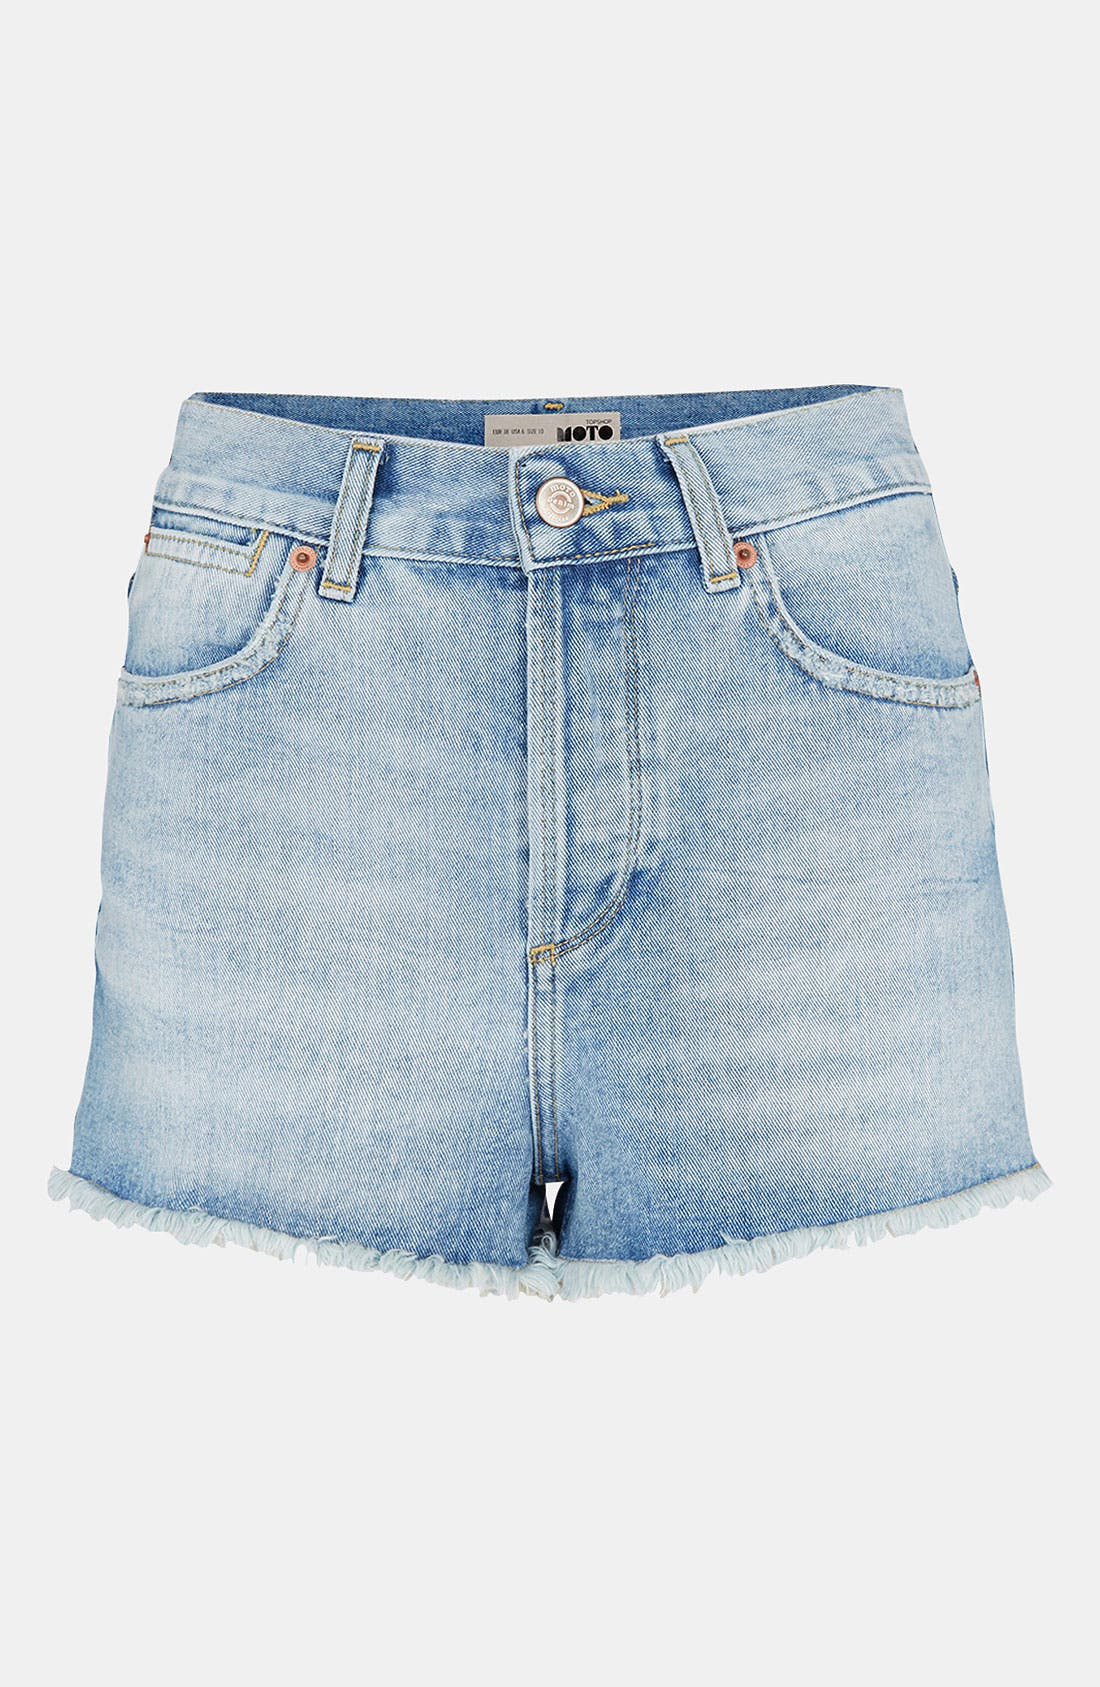 Alternate Image 1 Selected - Topshop Moto 'Ruthie' Cutoff Denim Shorts